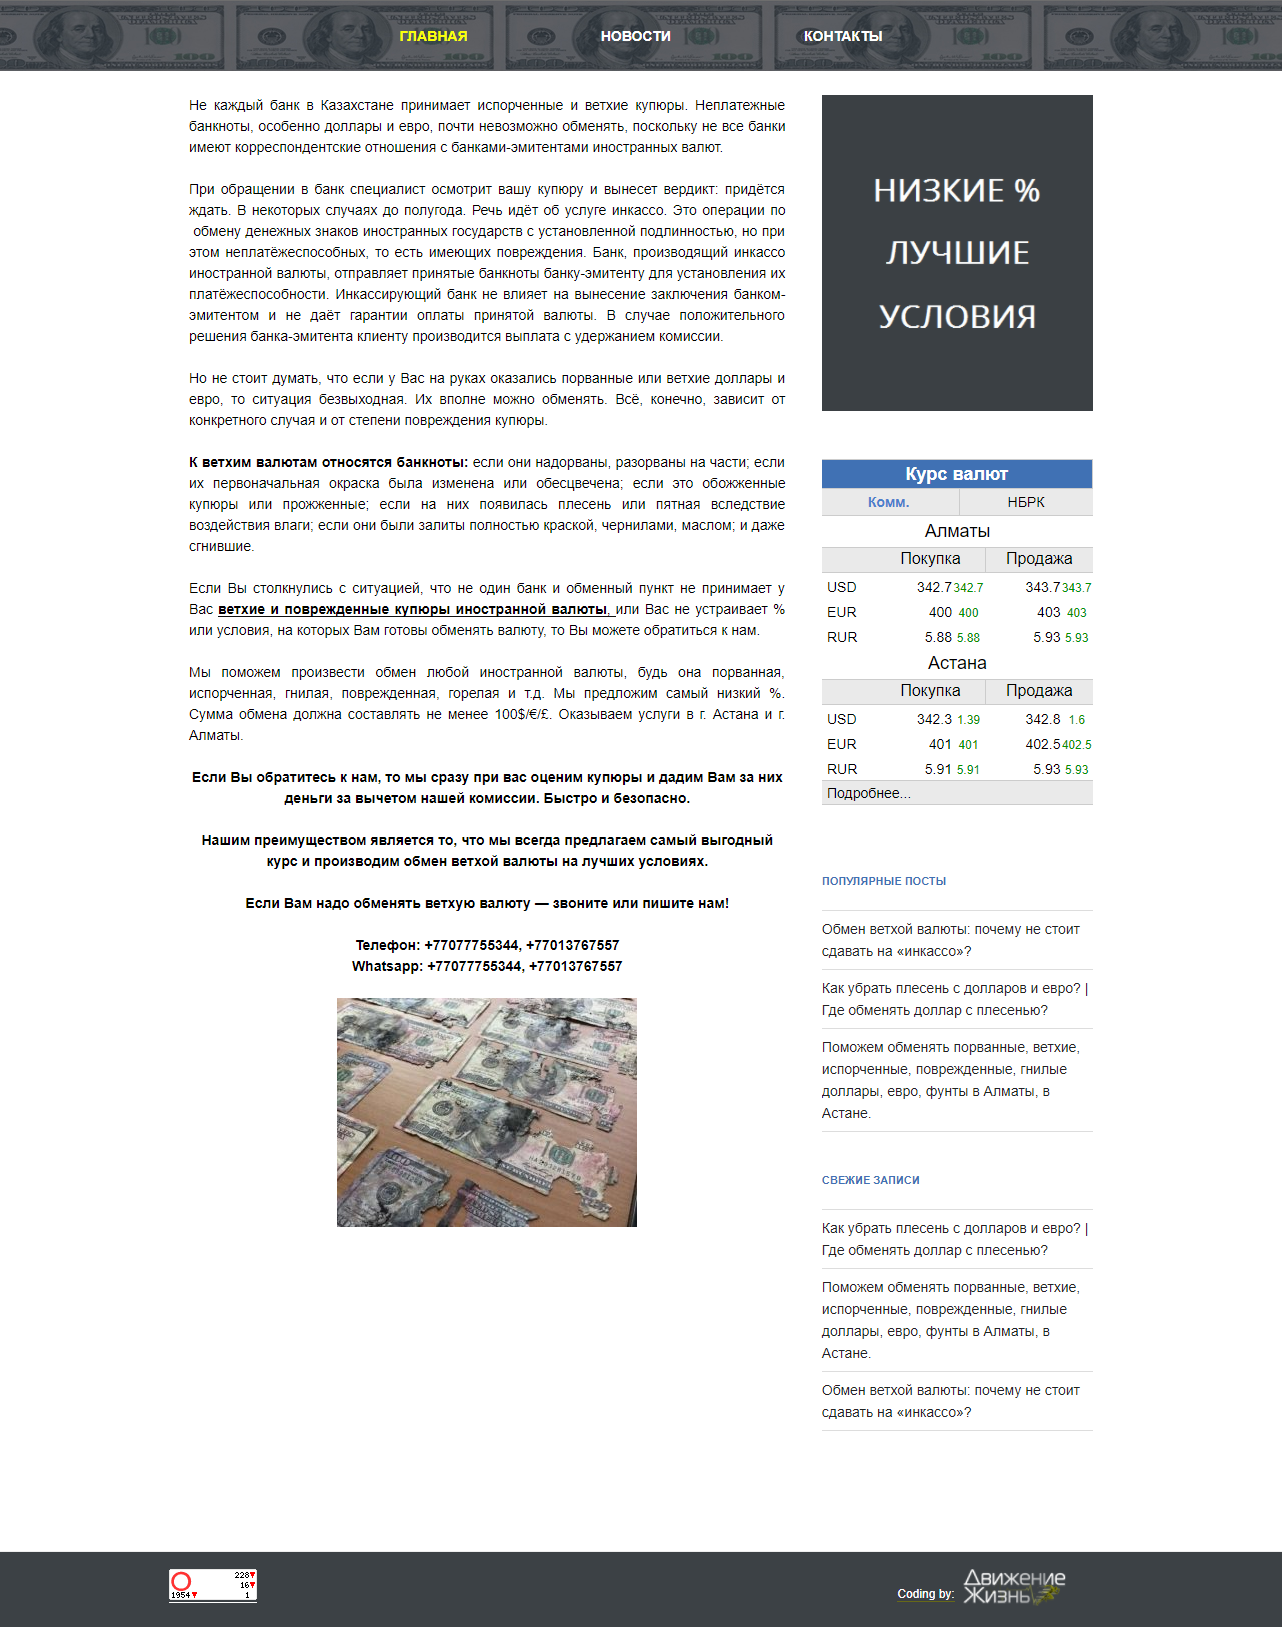 Сайт визитка — obmen-valut.kz